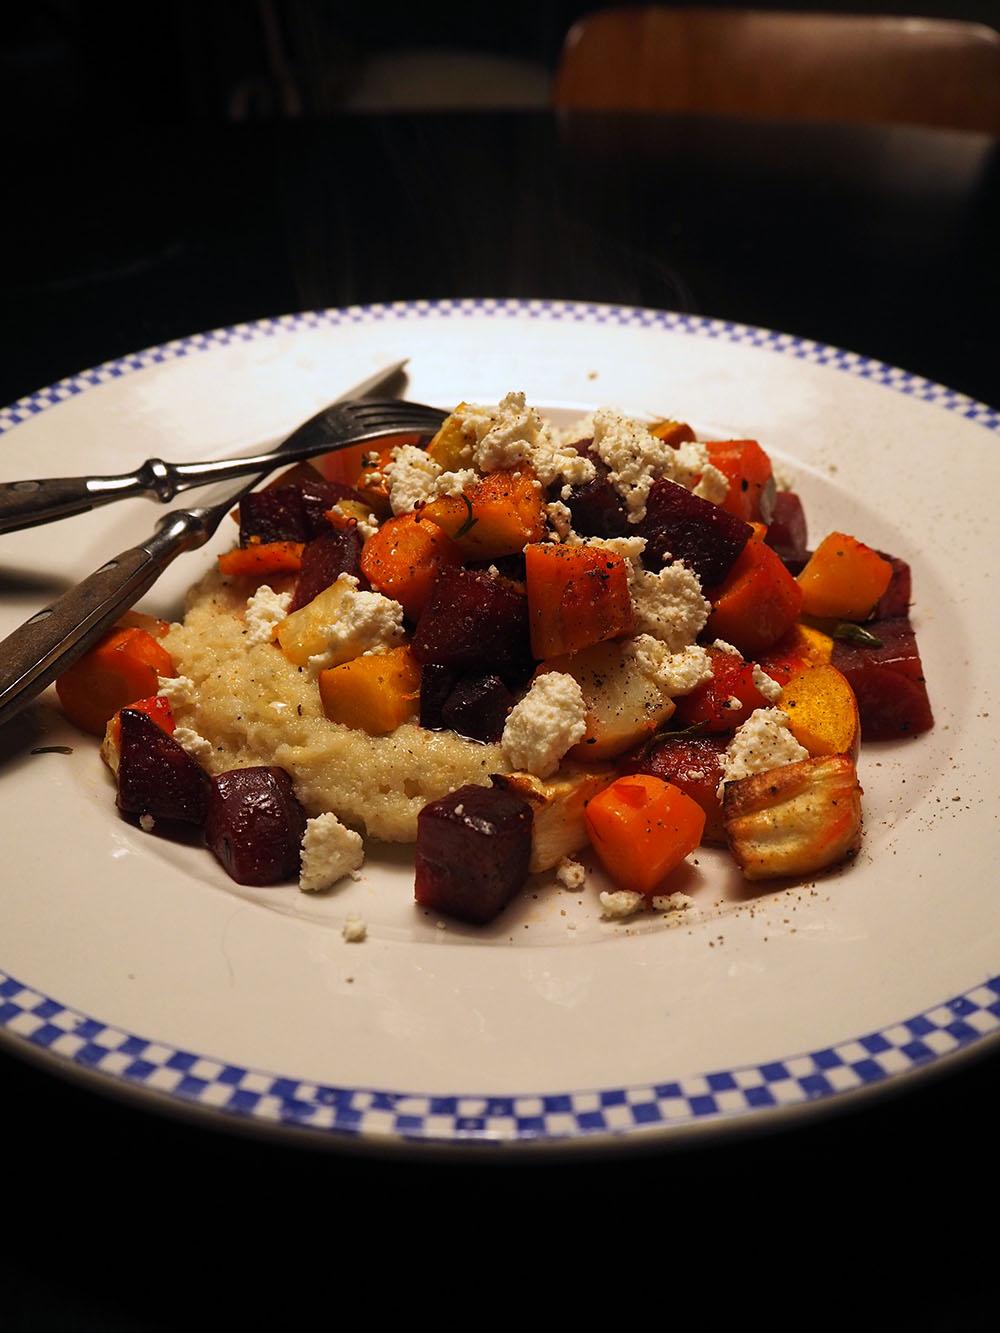 Empty the Fridge - Geroosterde wintergroenten met polenta ricotta en hazelnoetolie